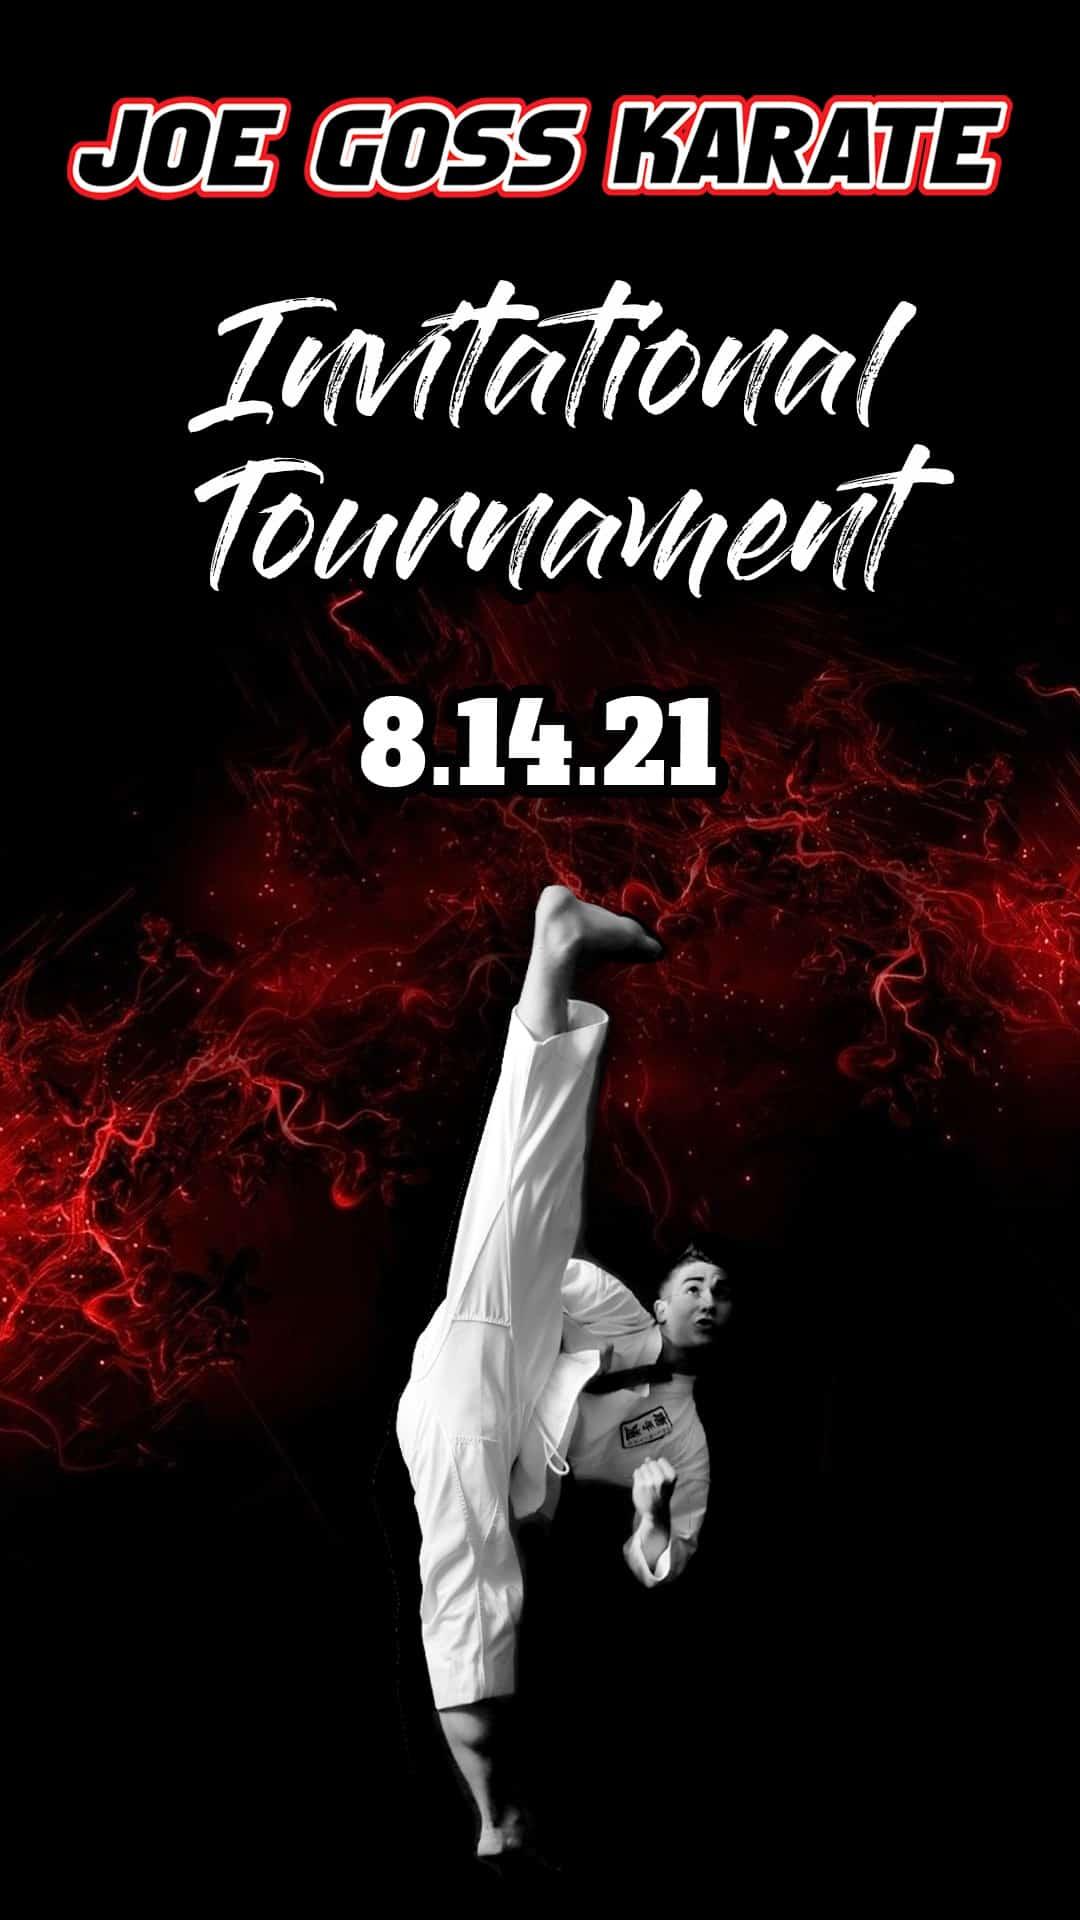 Joe Goss Karate Invitational Tournament